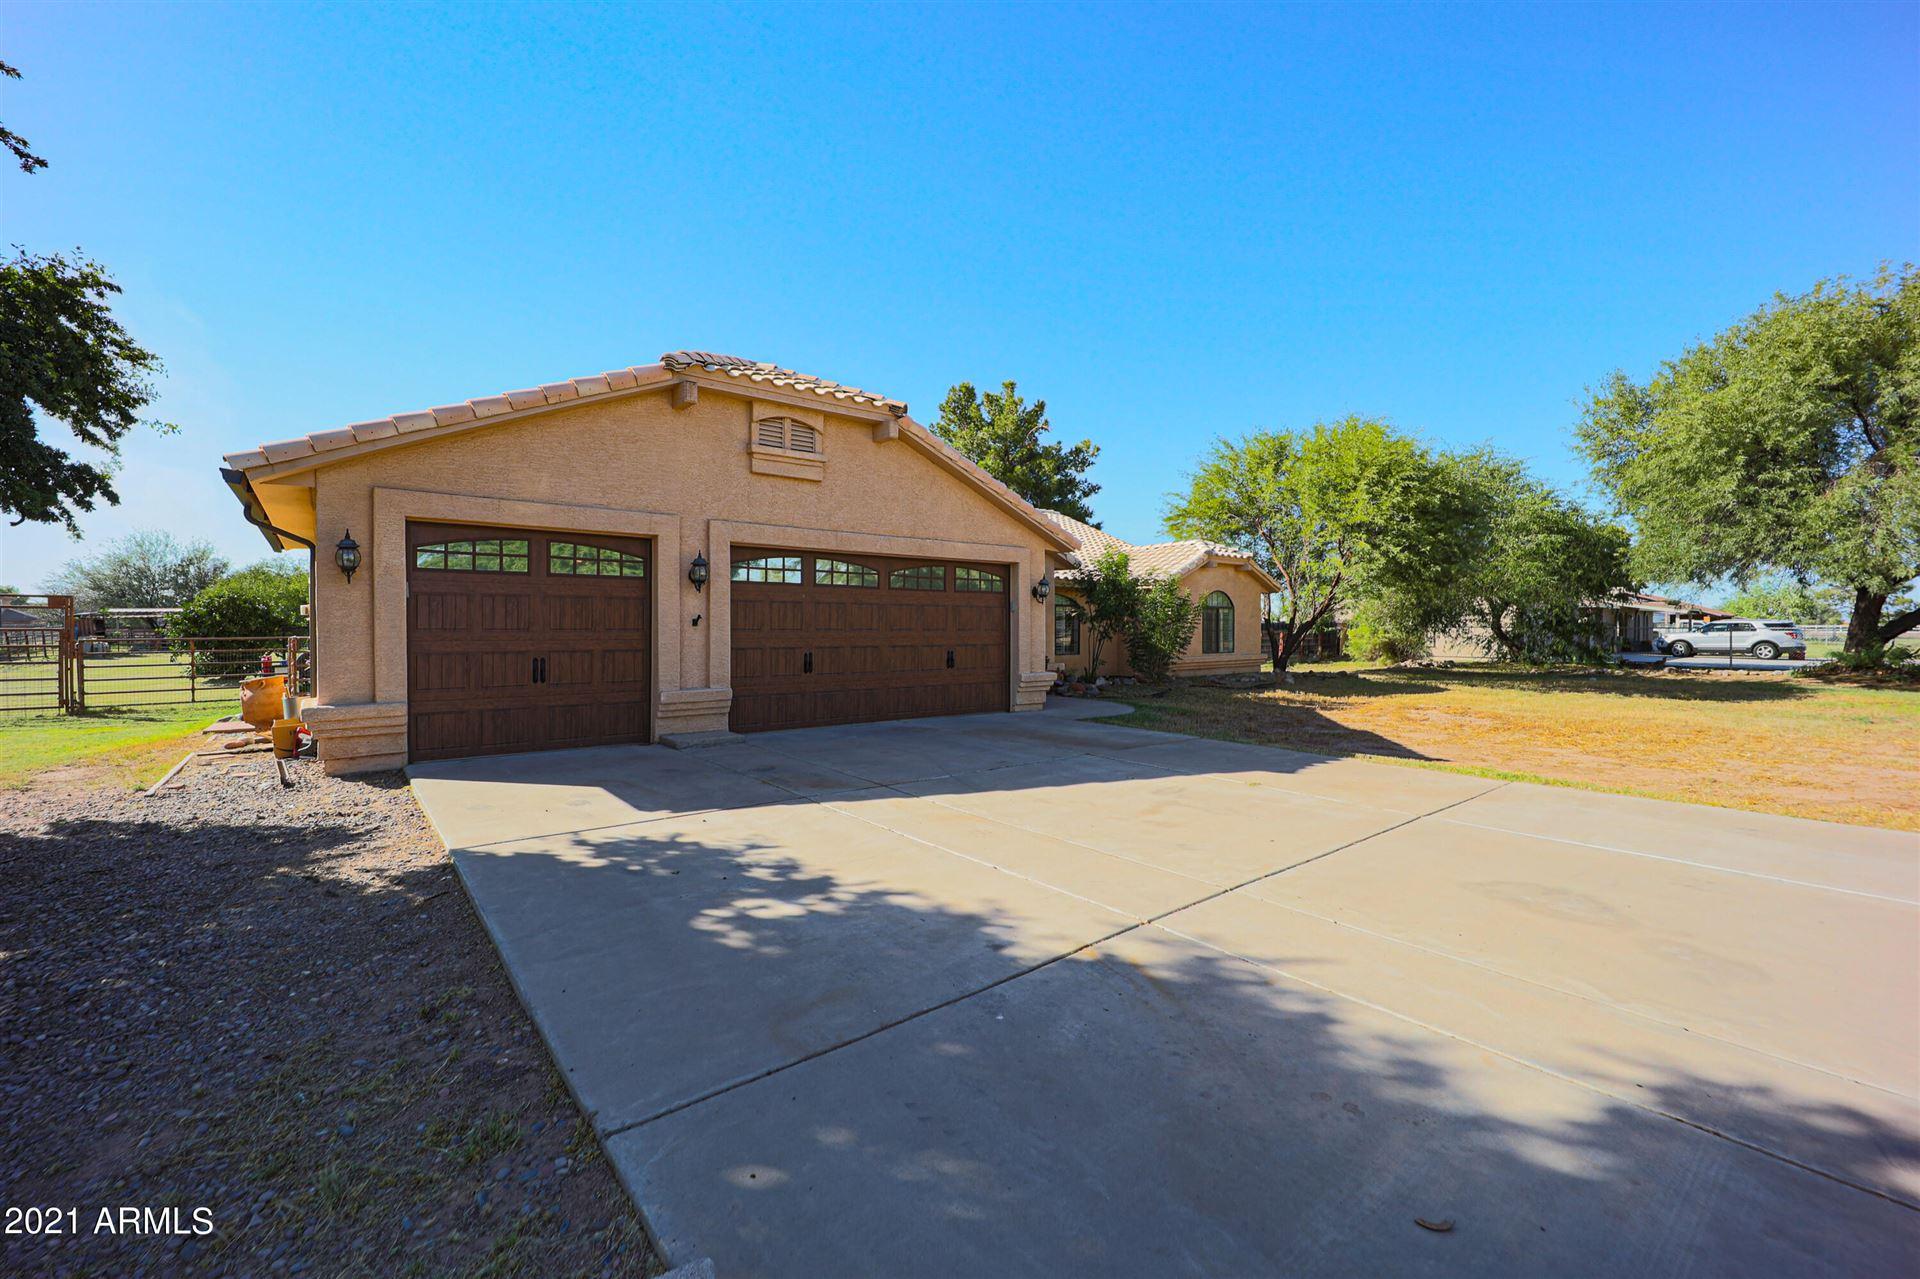 Photo of 6036 S 66TH Avenue, Laveen, AZ 85339 (MLS # 6306743)